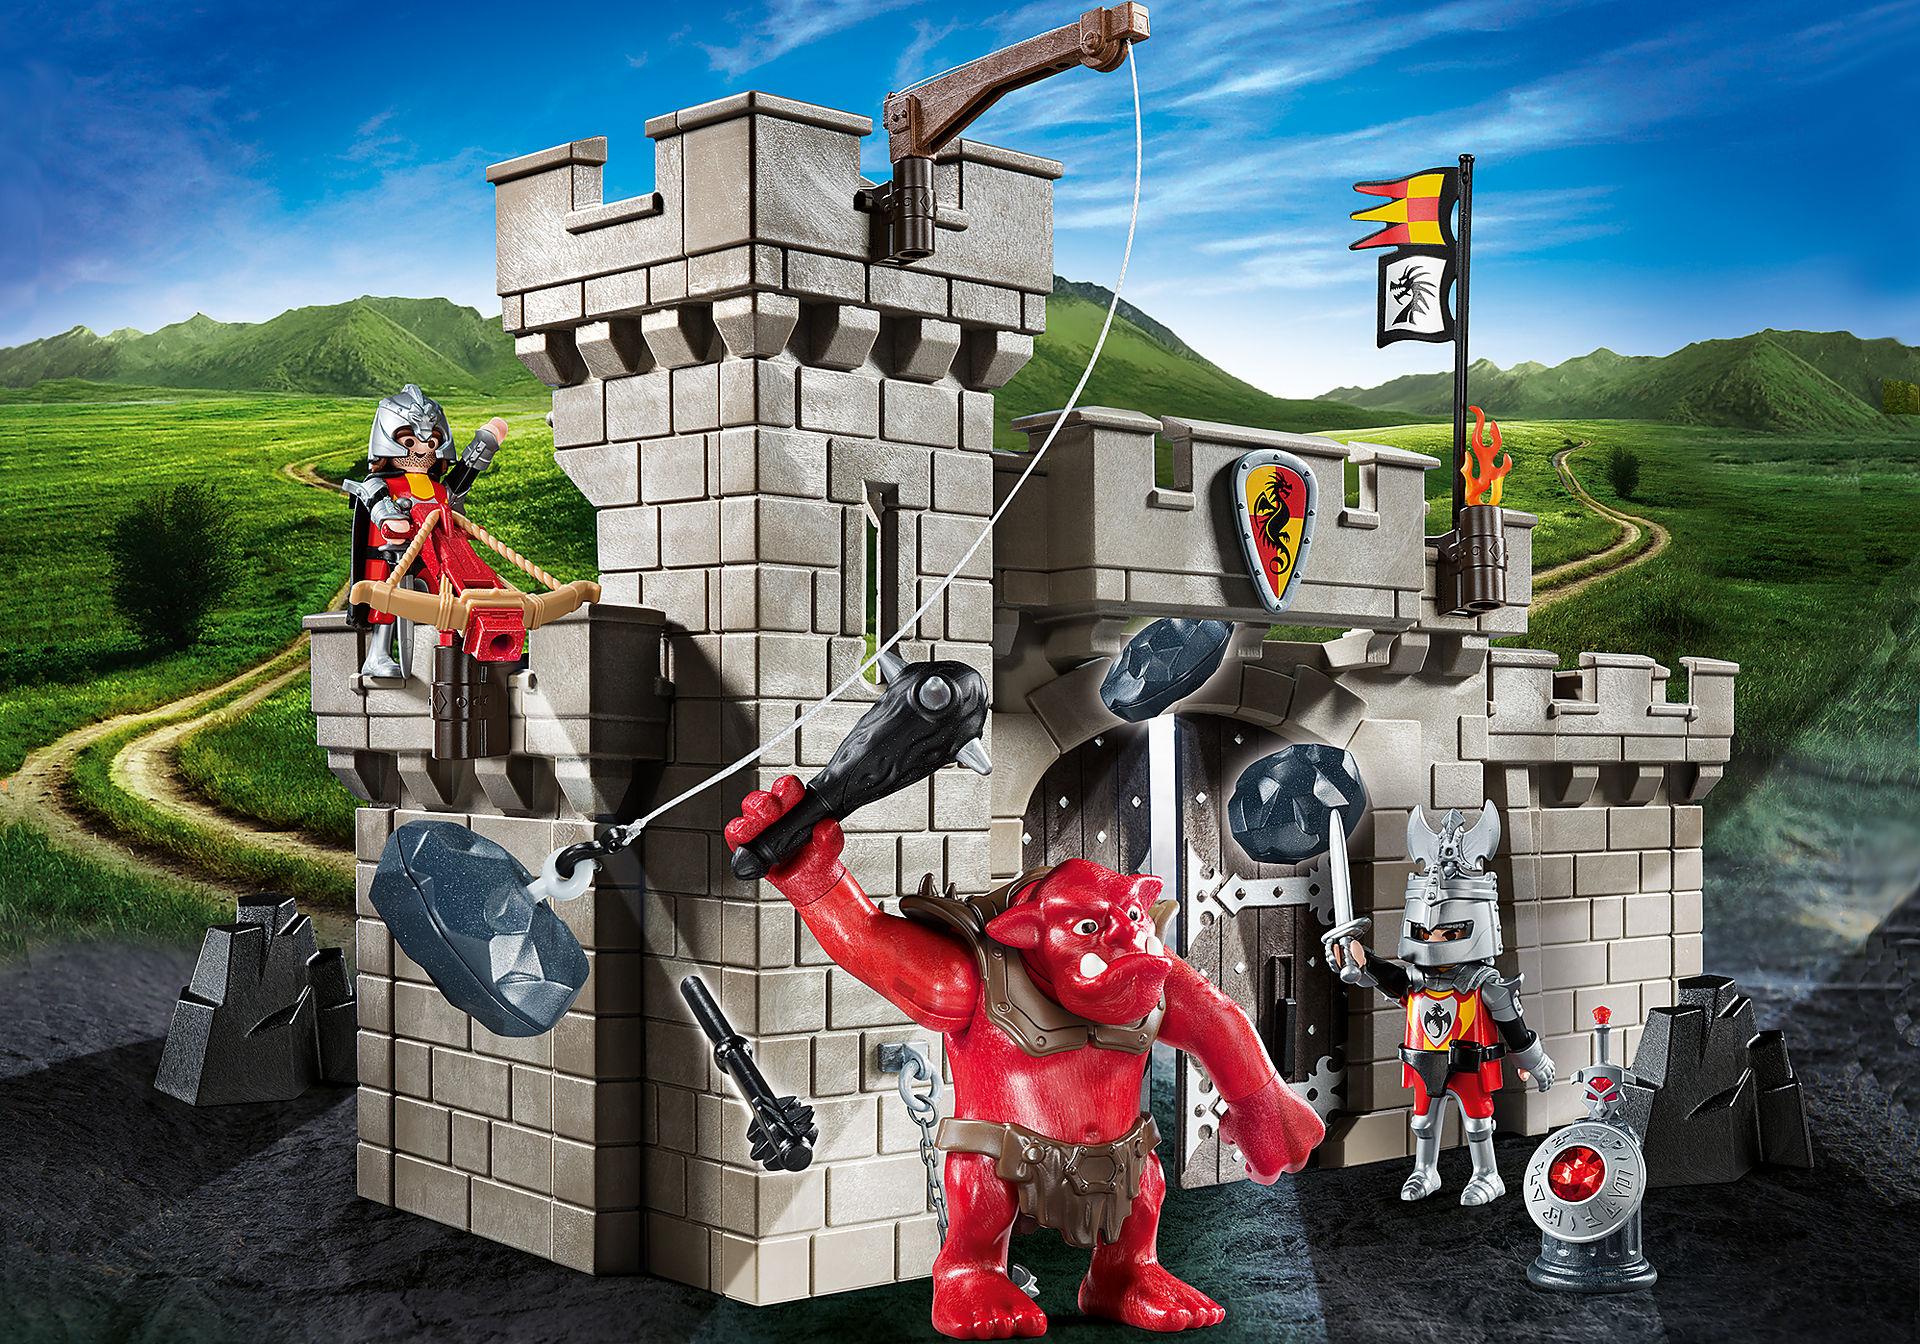 http://media.playmobil.com/i/playmobil/5670_product_detail/Assalto al castello con troll